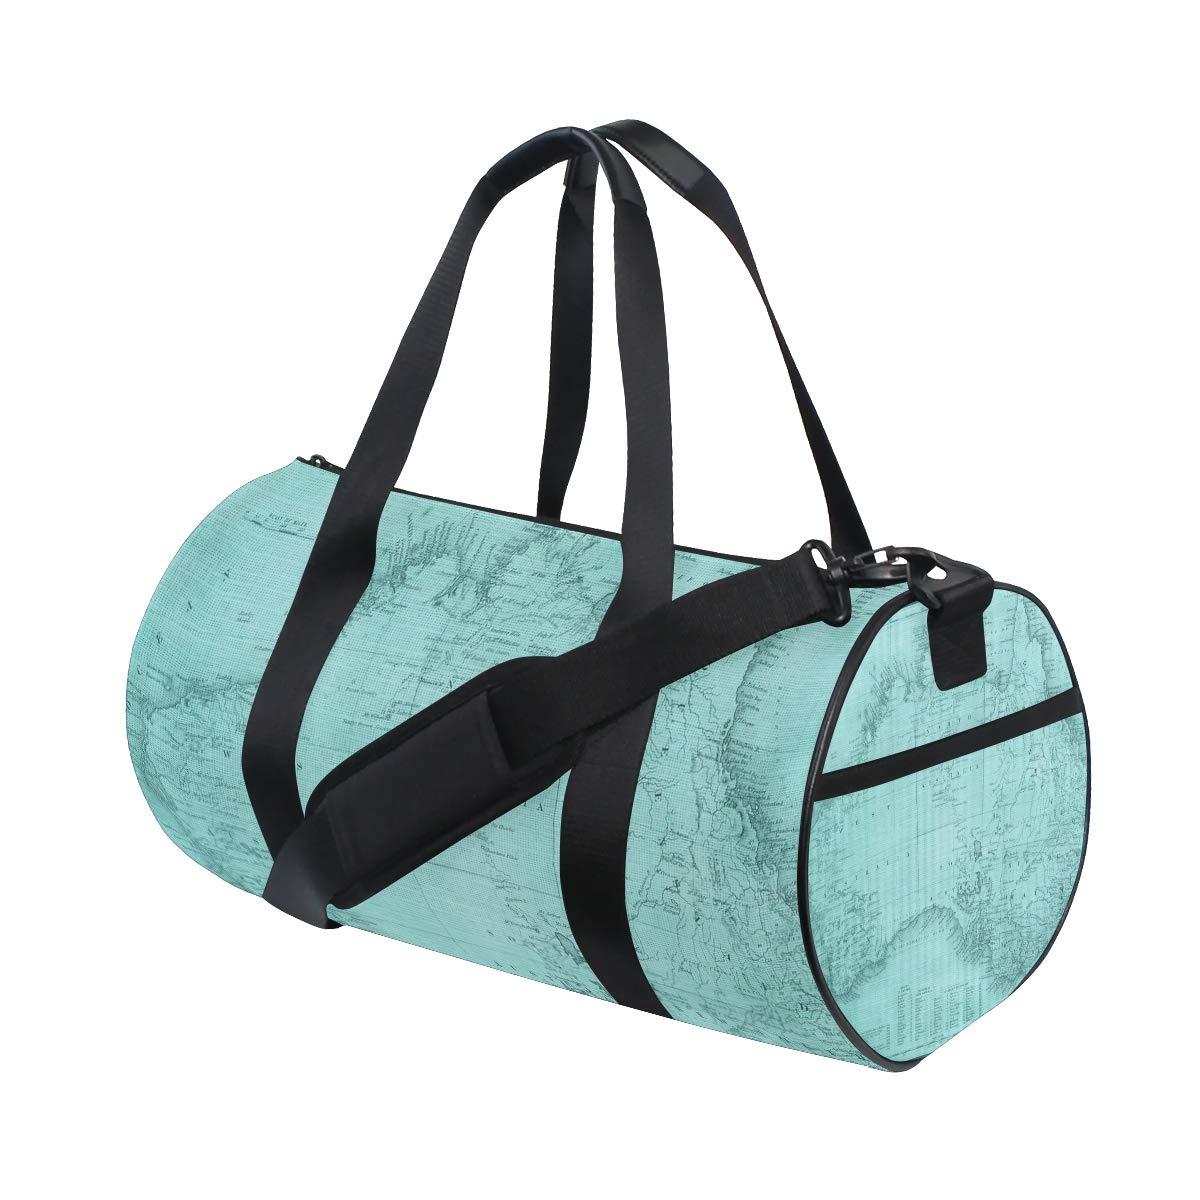 Vintage Patina Maps Travel Duffel Bag Sports Gym Duffel Bag Luggage Handbag for Men Women